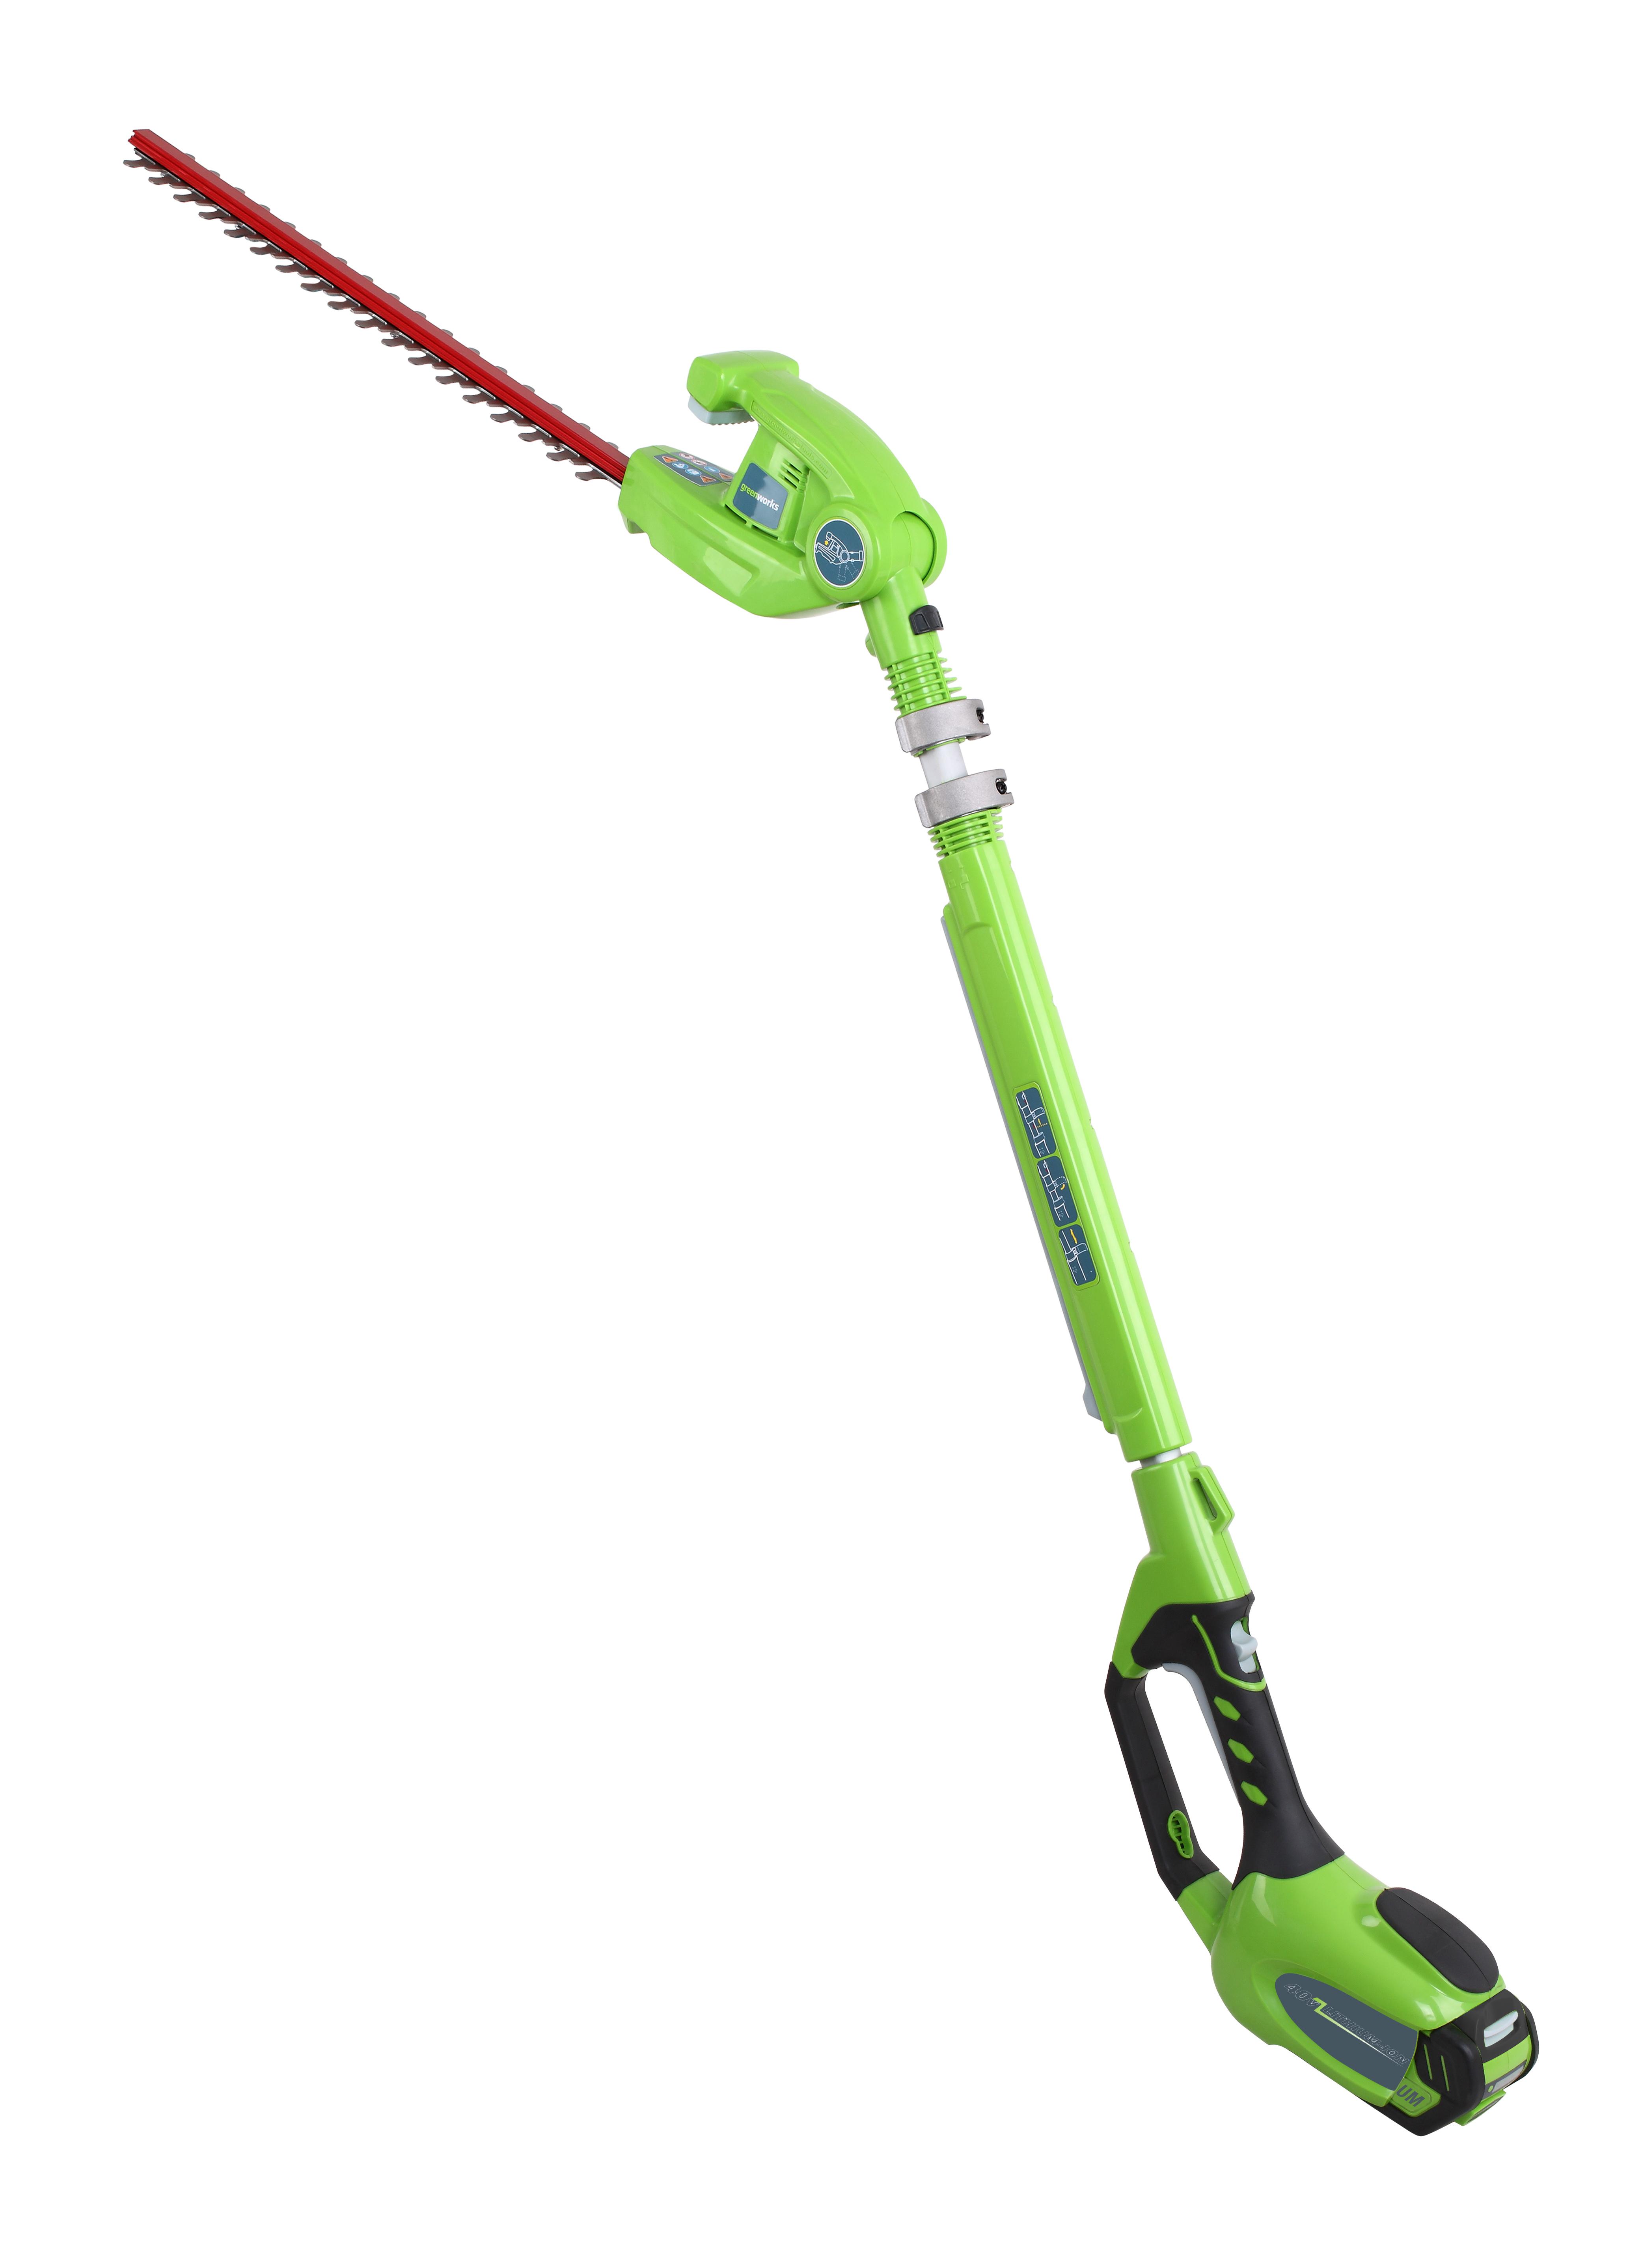 Aku 40V plotostřih 51 cm s dlouhým dosahem Greenworks G40PH51